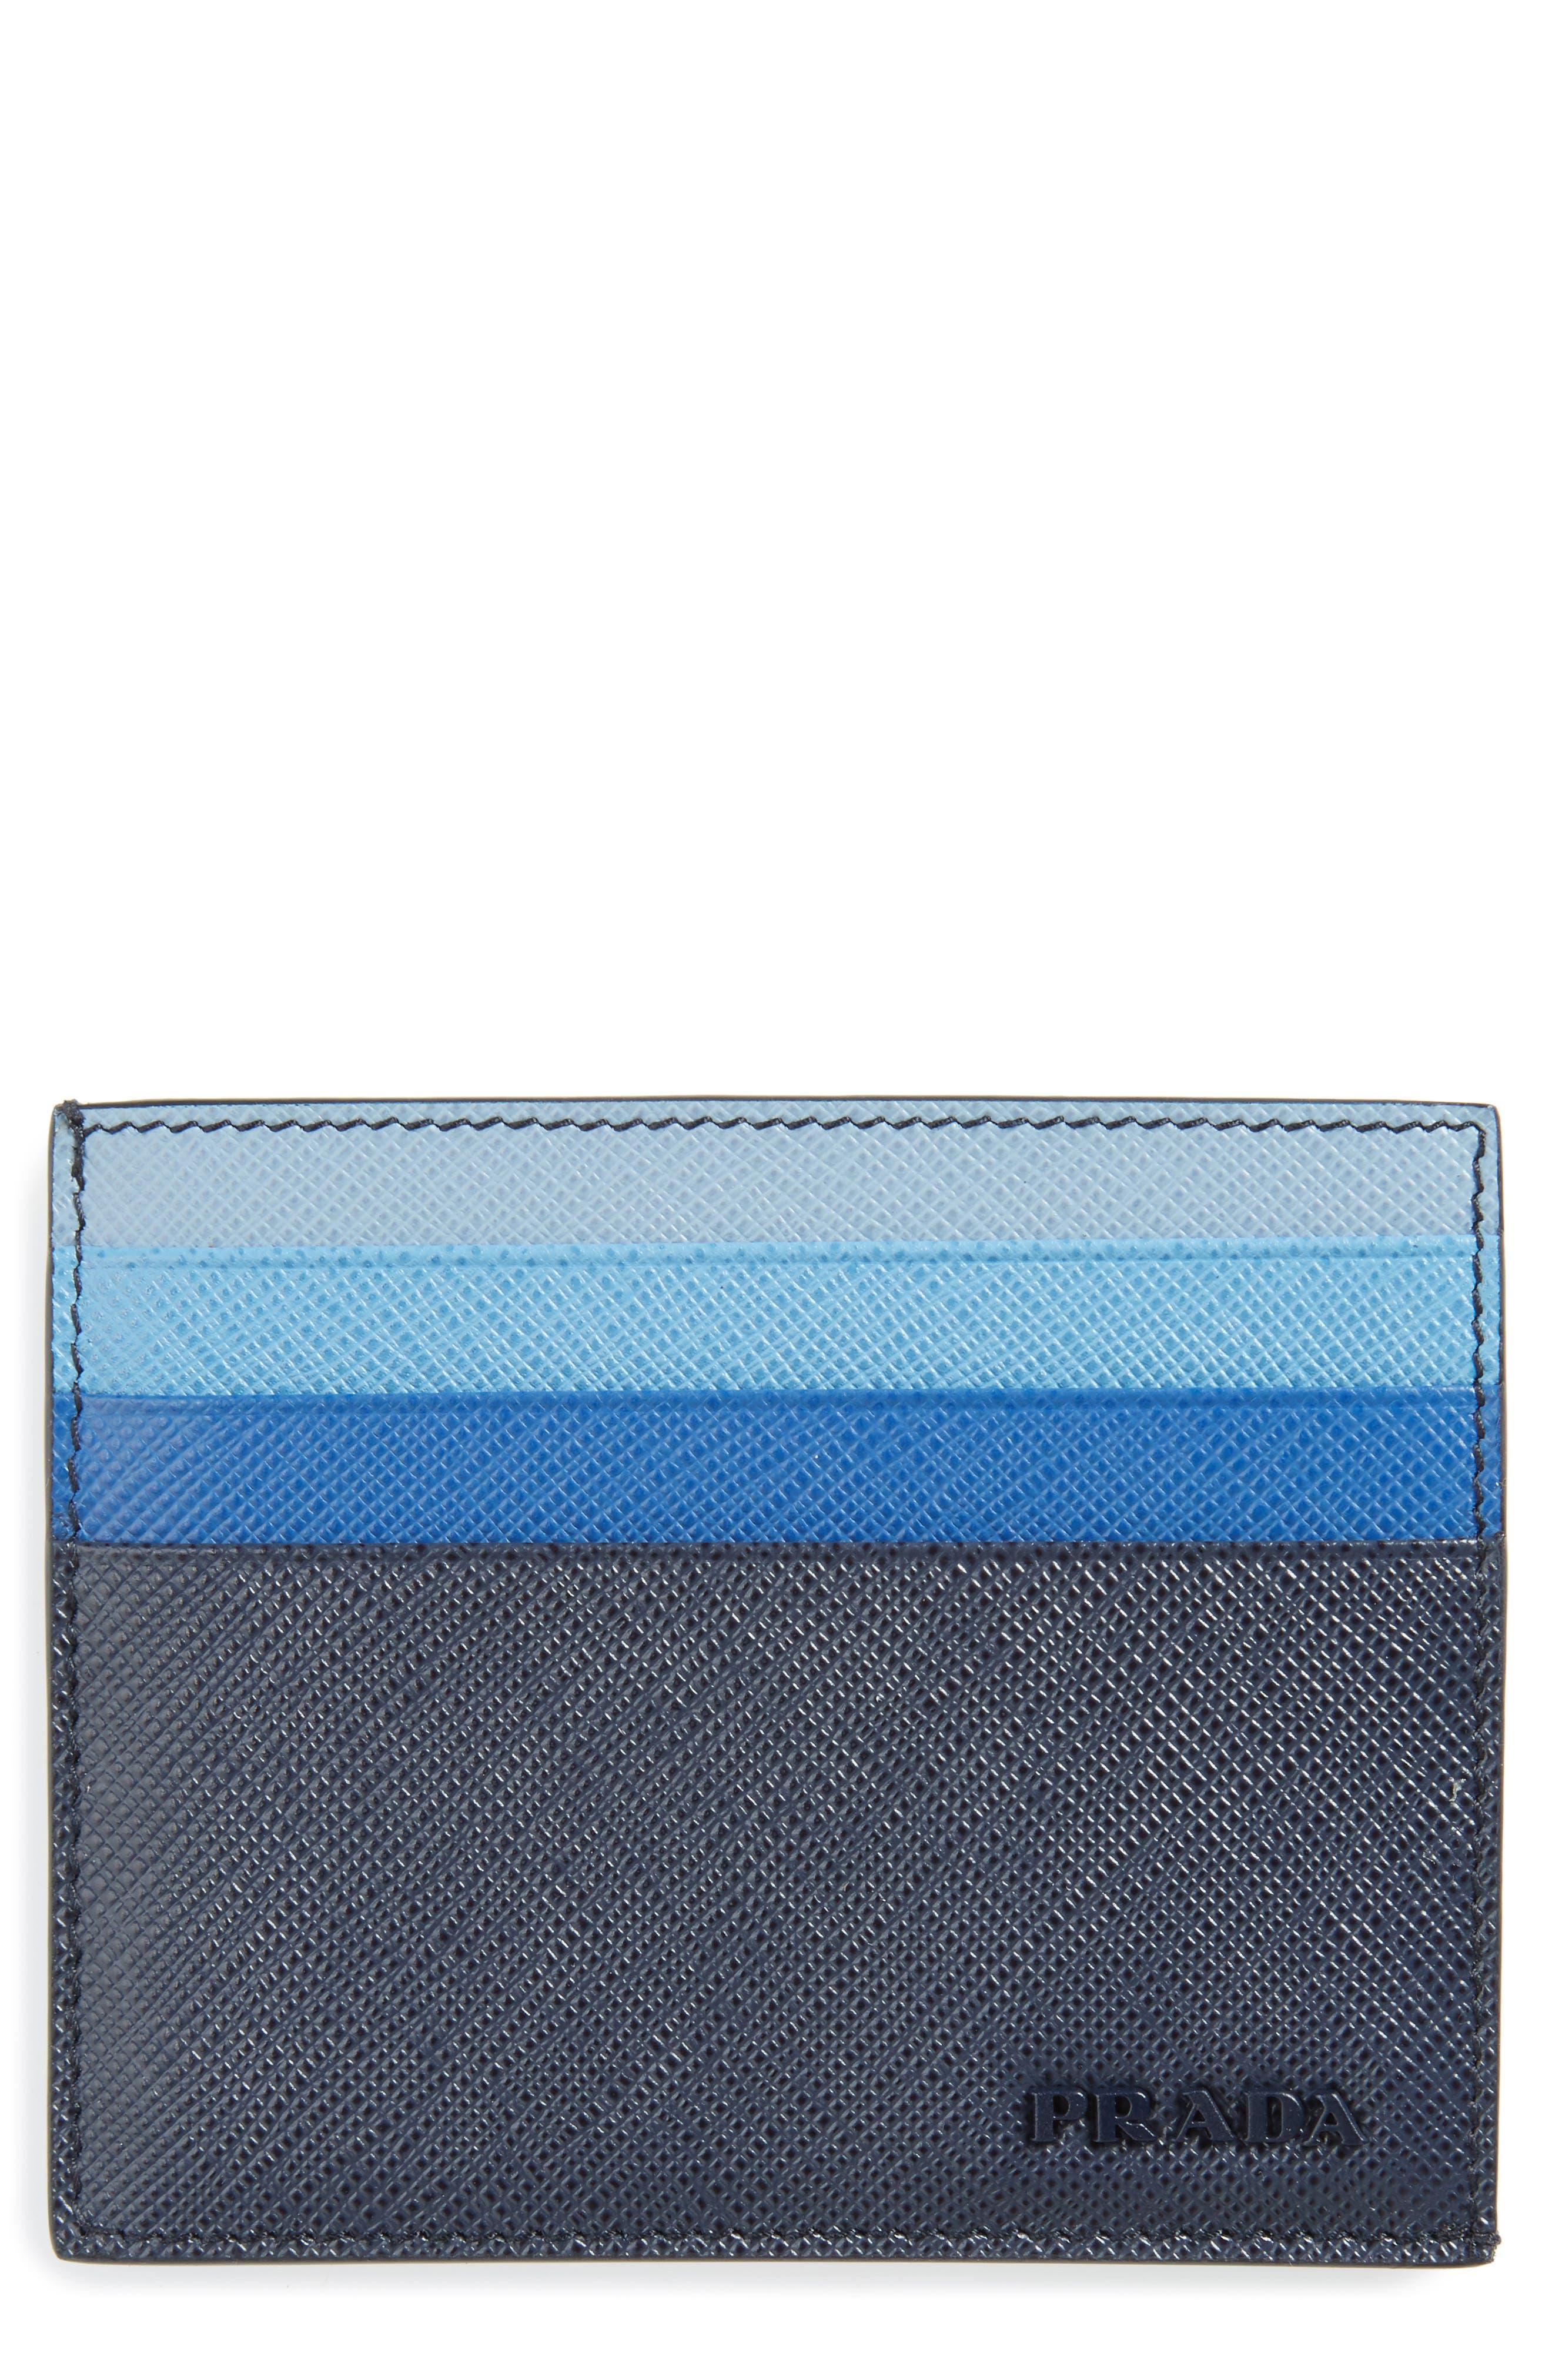 Prada Multicolor Saffiano Leather